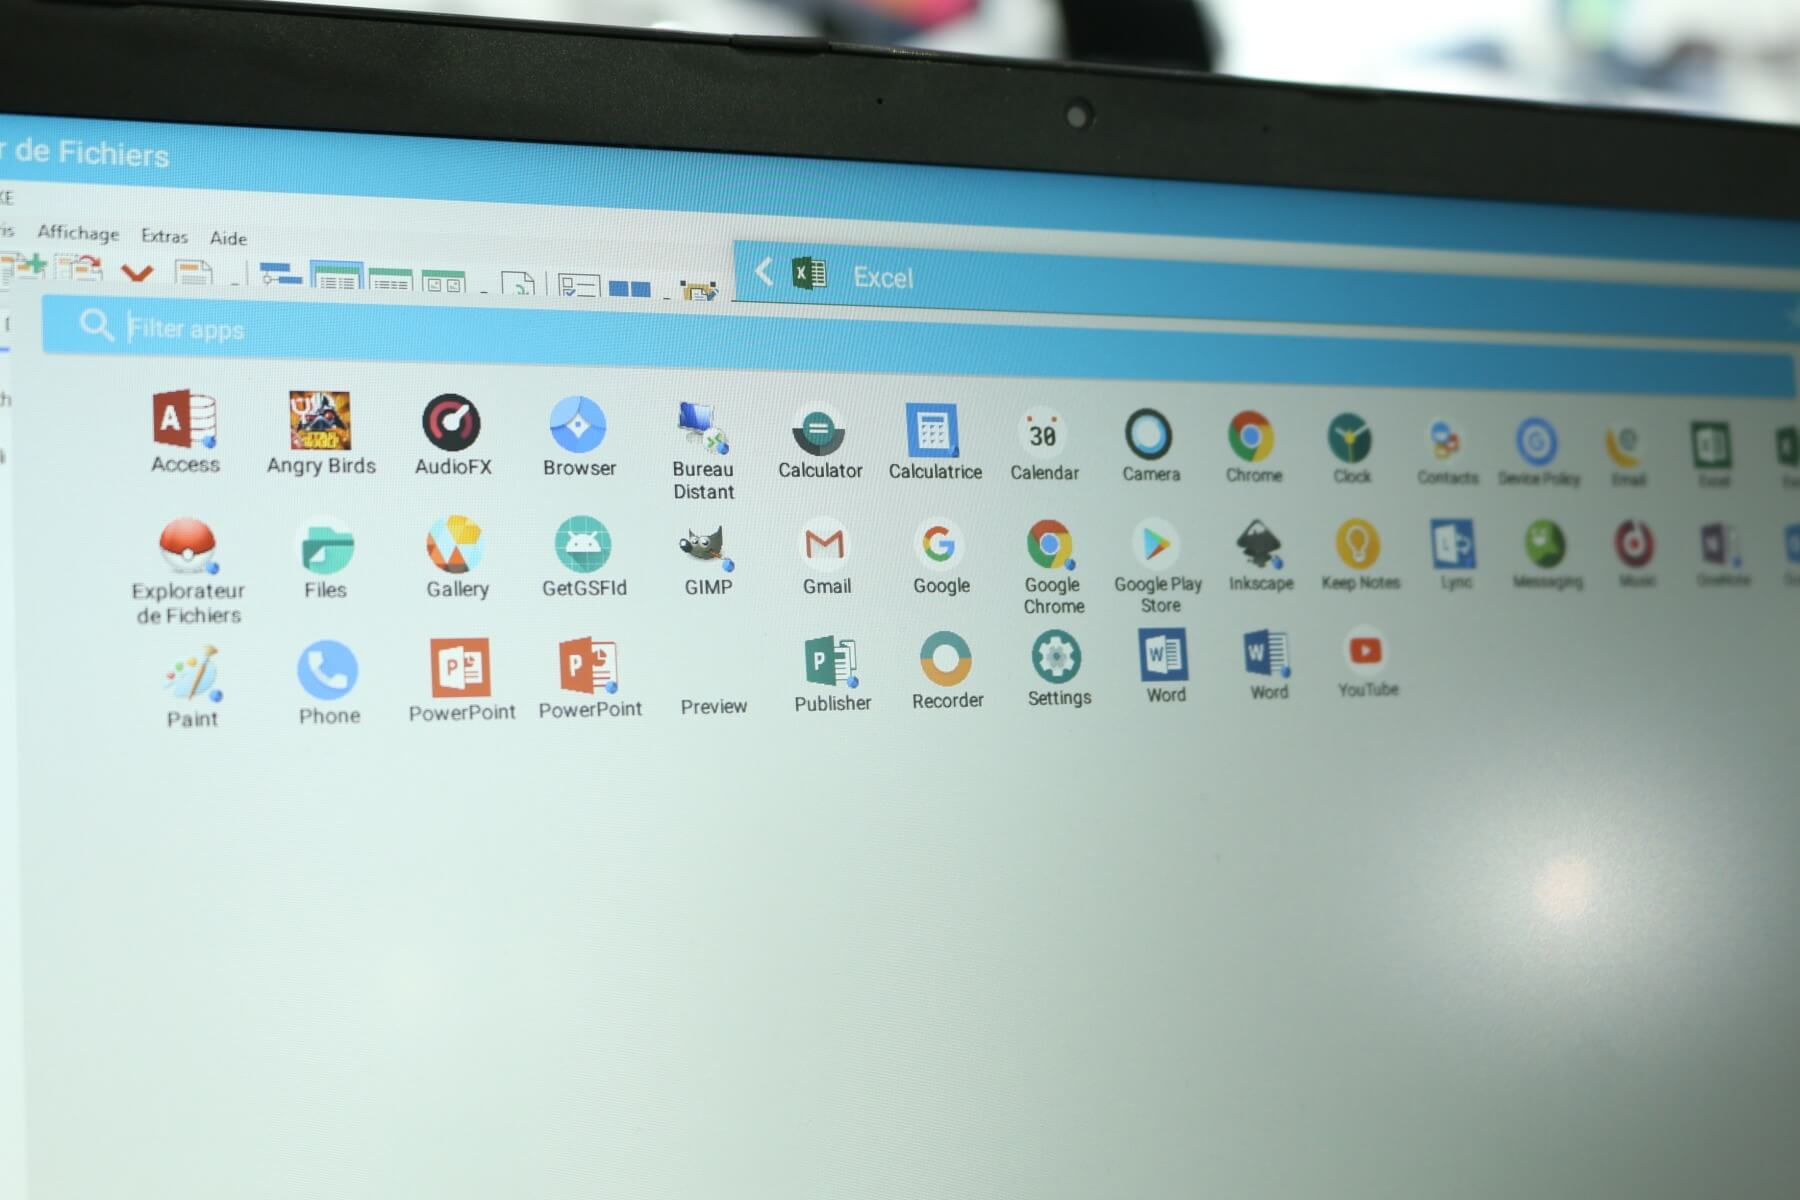 oxi smartphone desktop fr android mit support fr windows apps